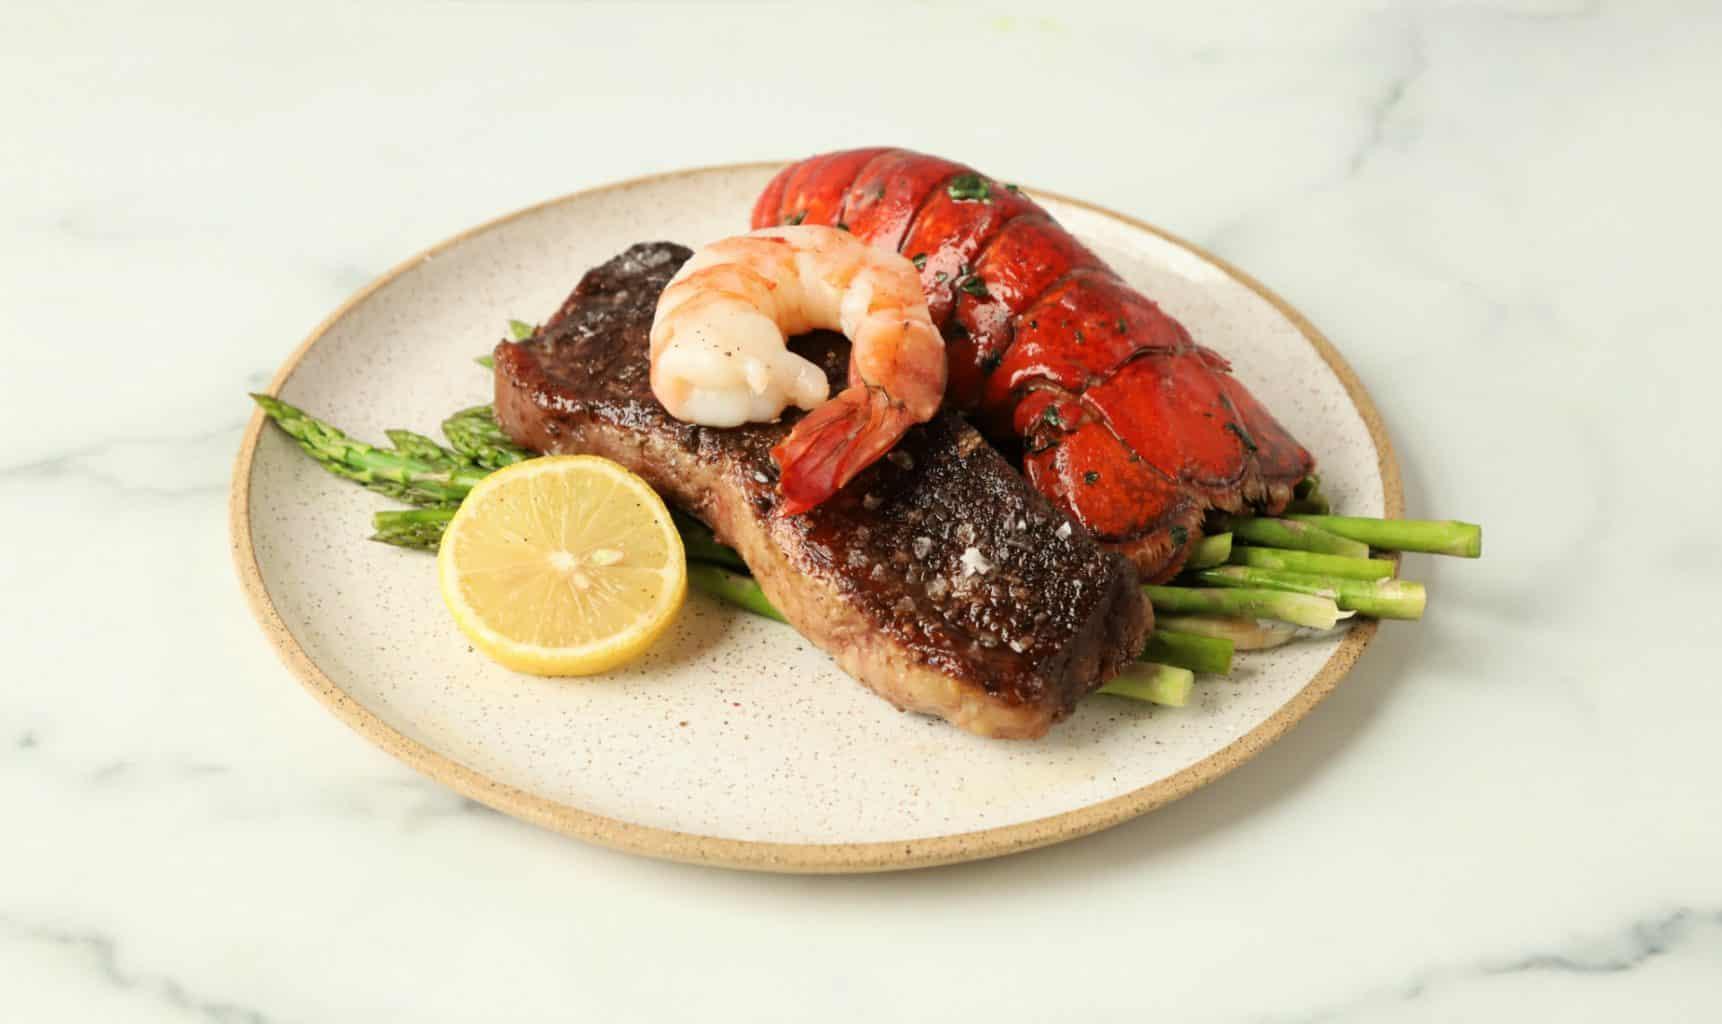 Steak Shrimp Surf and Turf